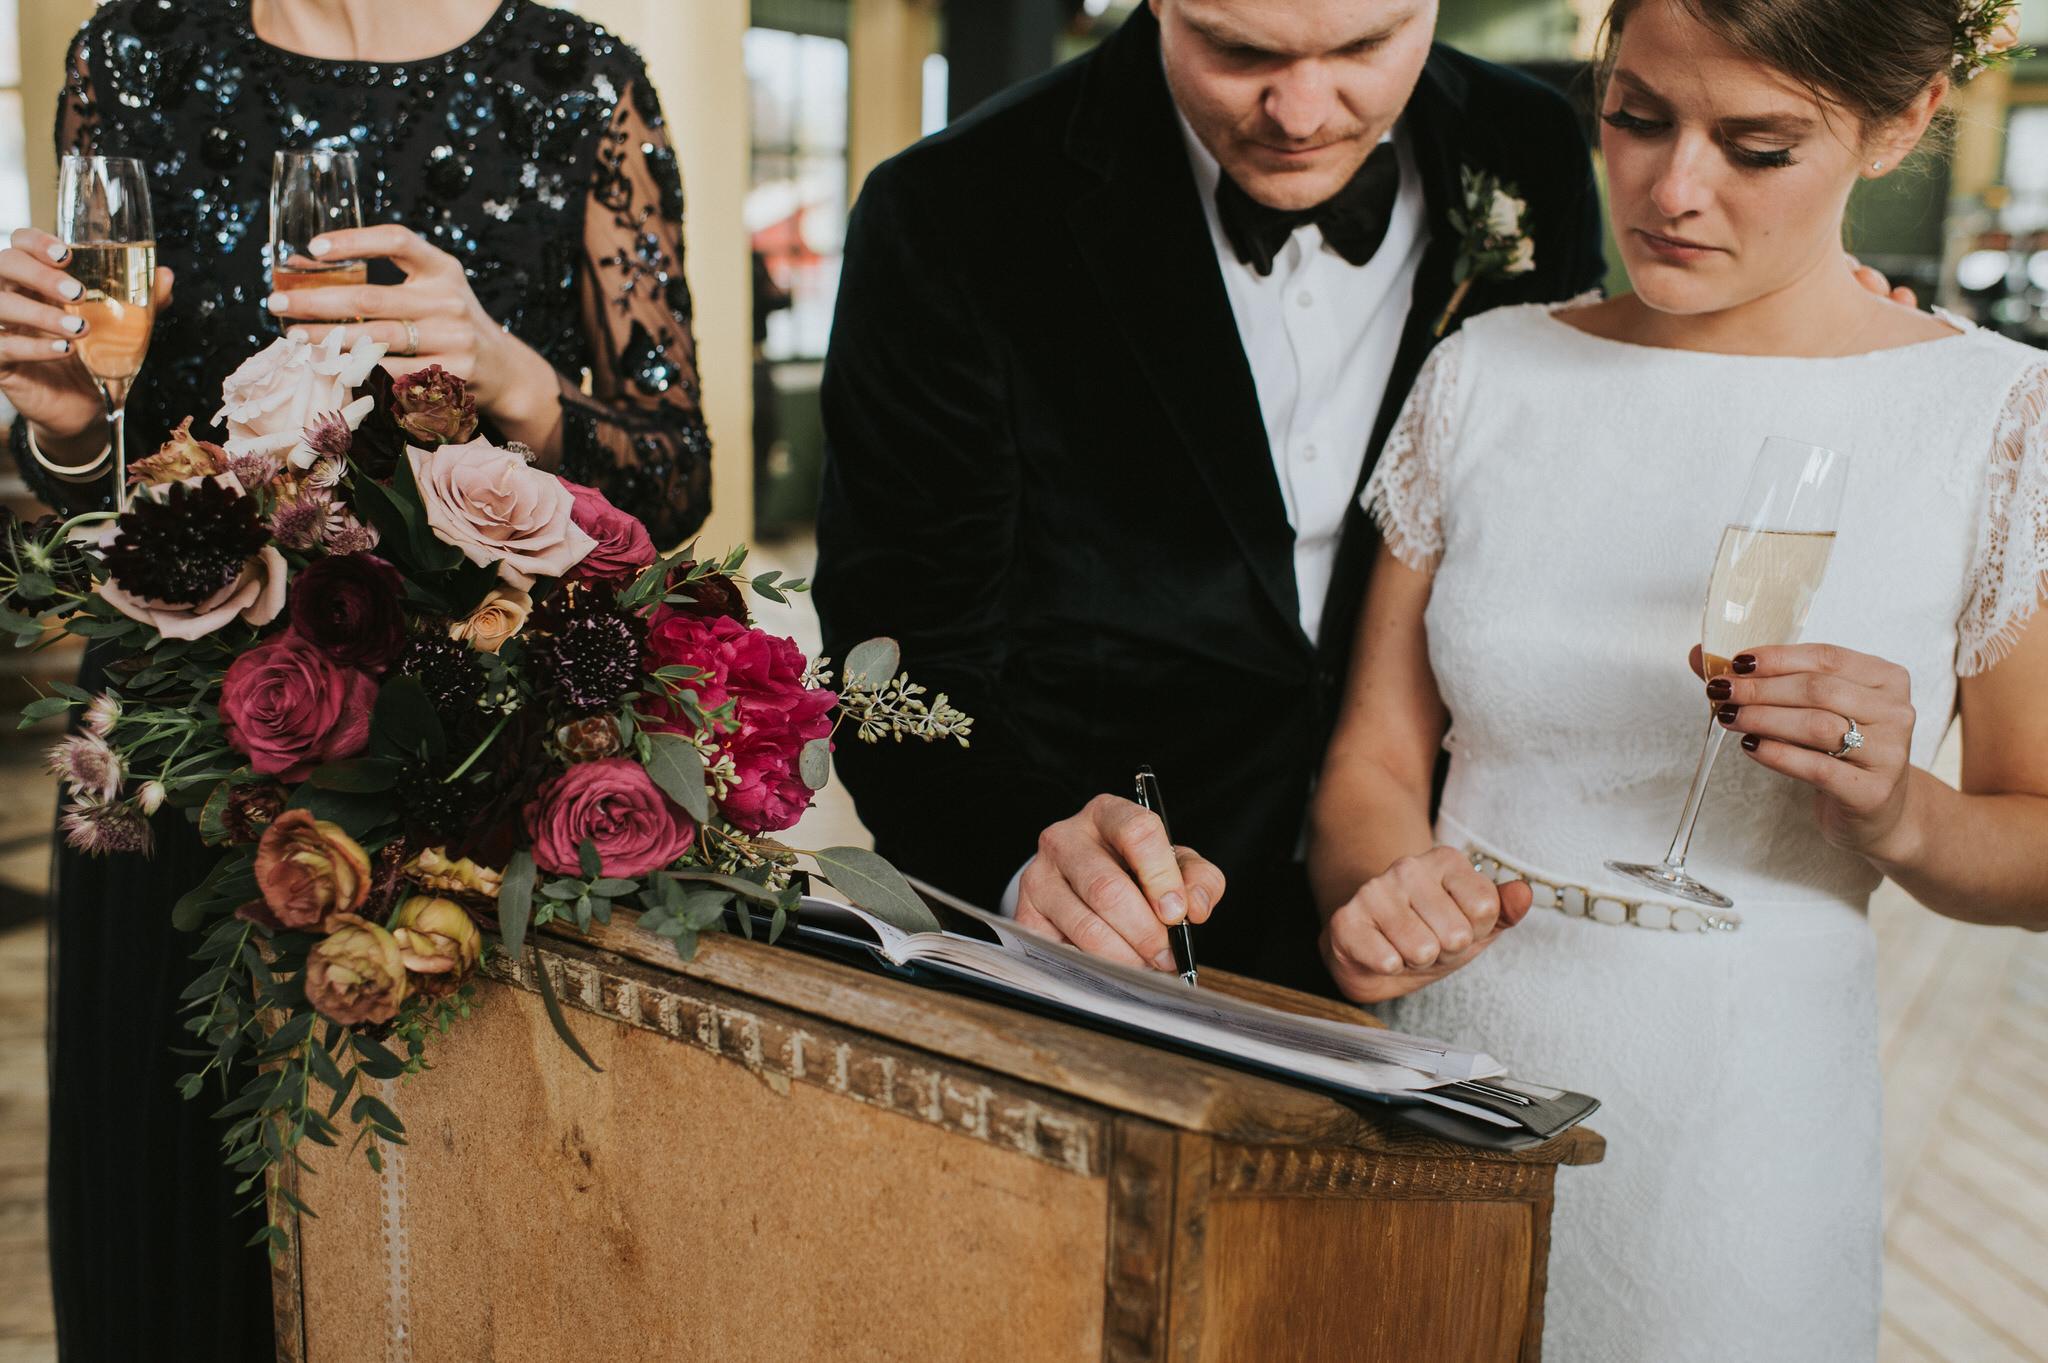 scarletoneillphotography_weddingphotography_prince edward county weddings127.JPG